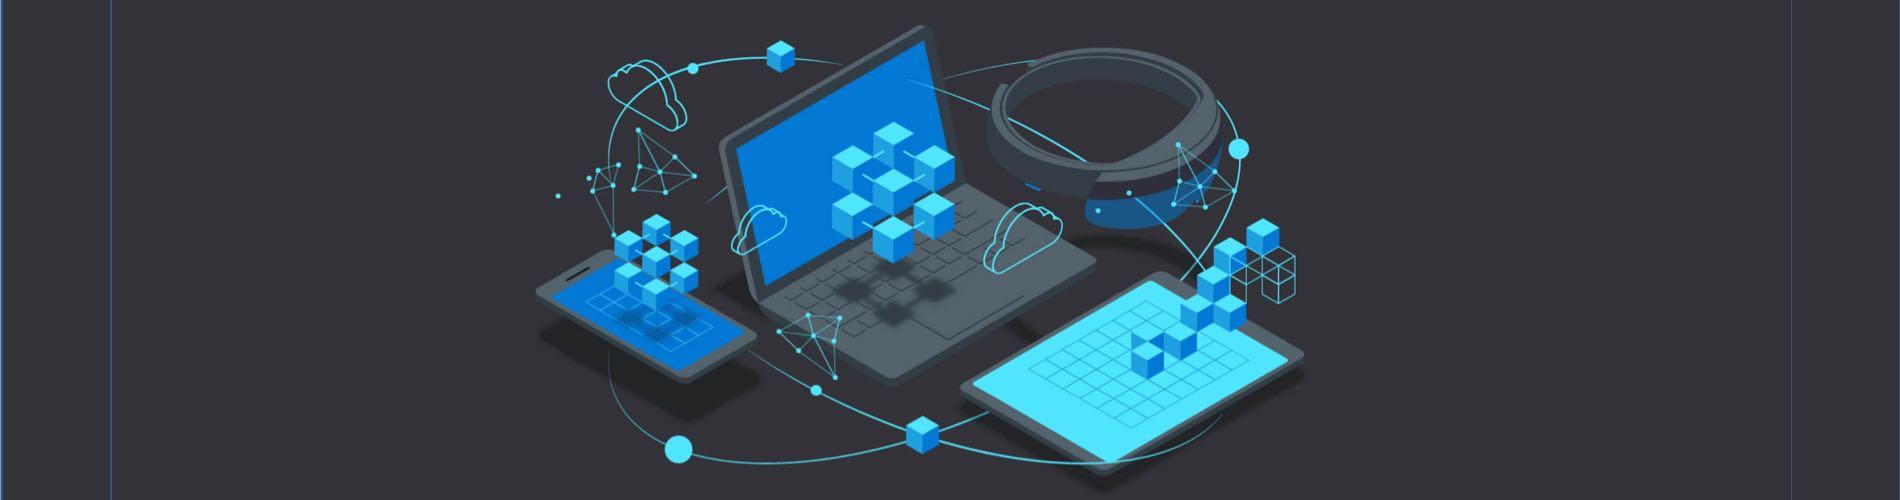 IoT Hub service on Microsoft Azure feature image